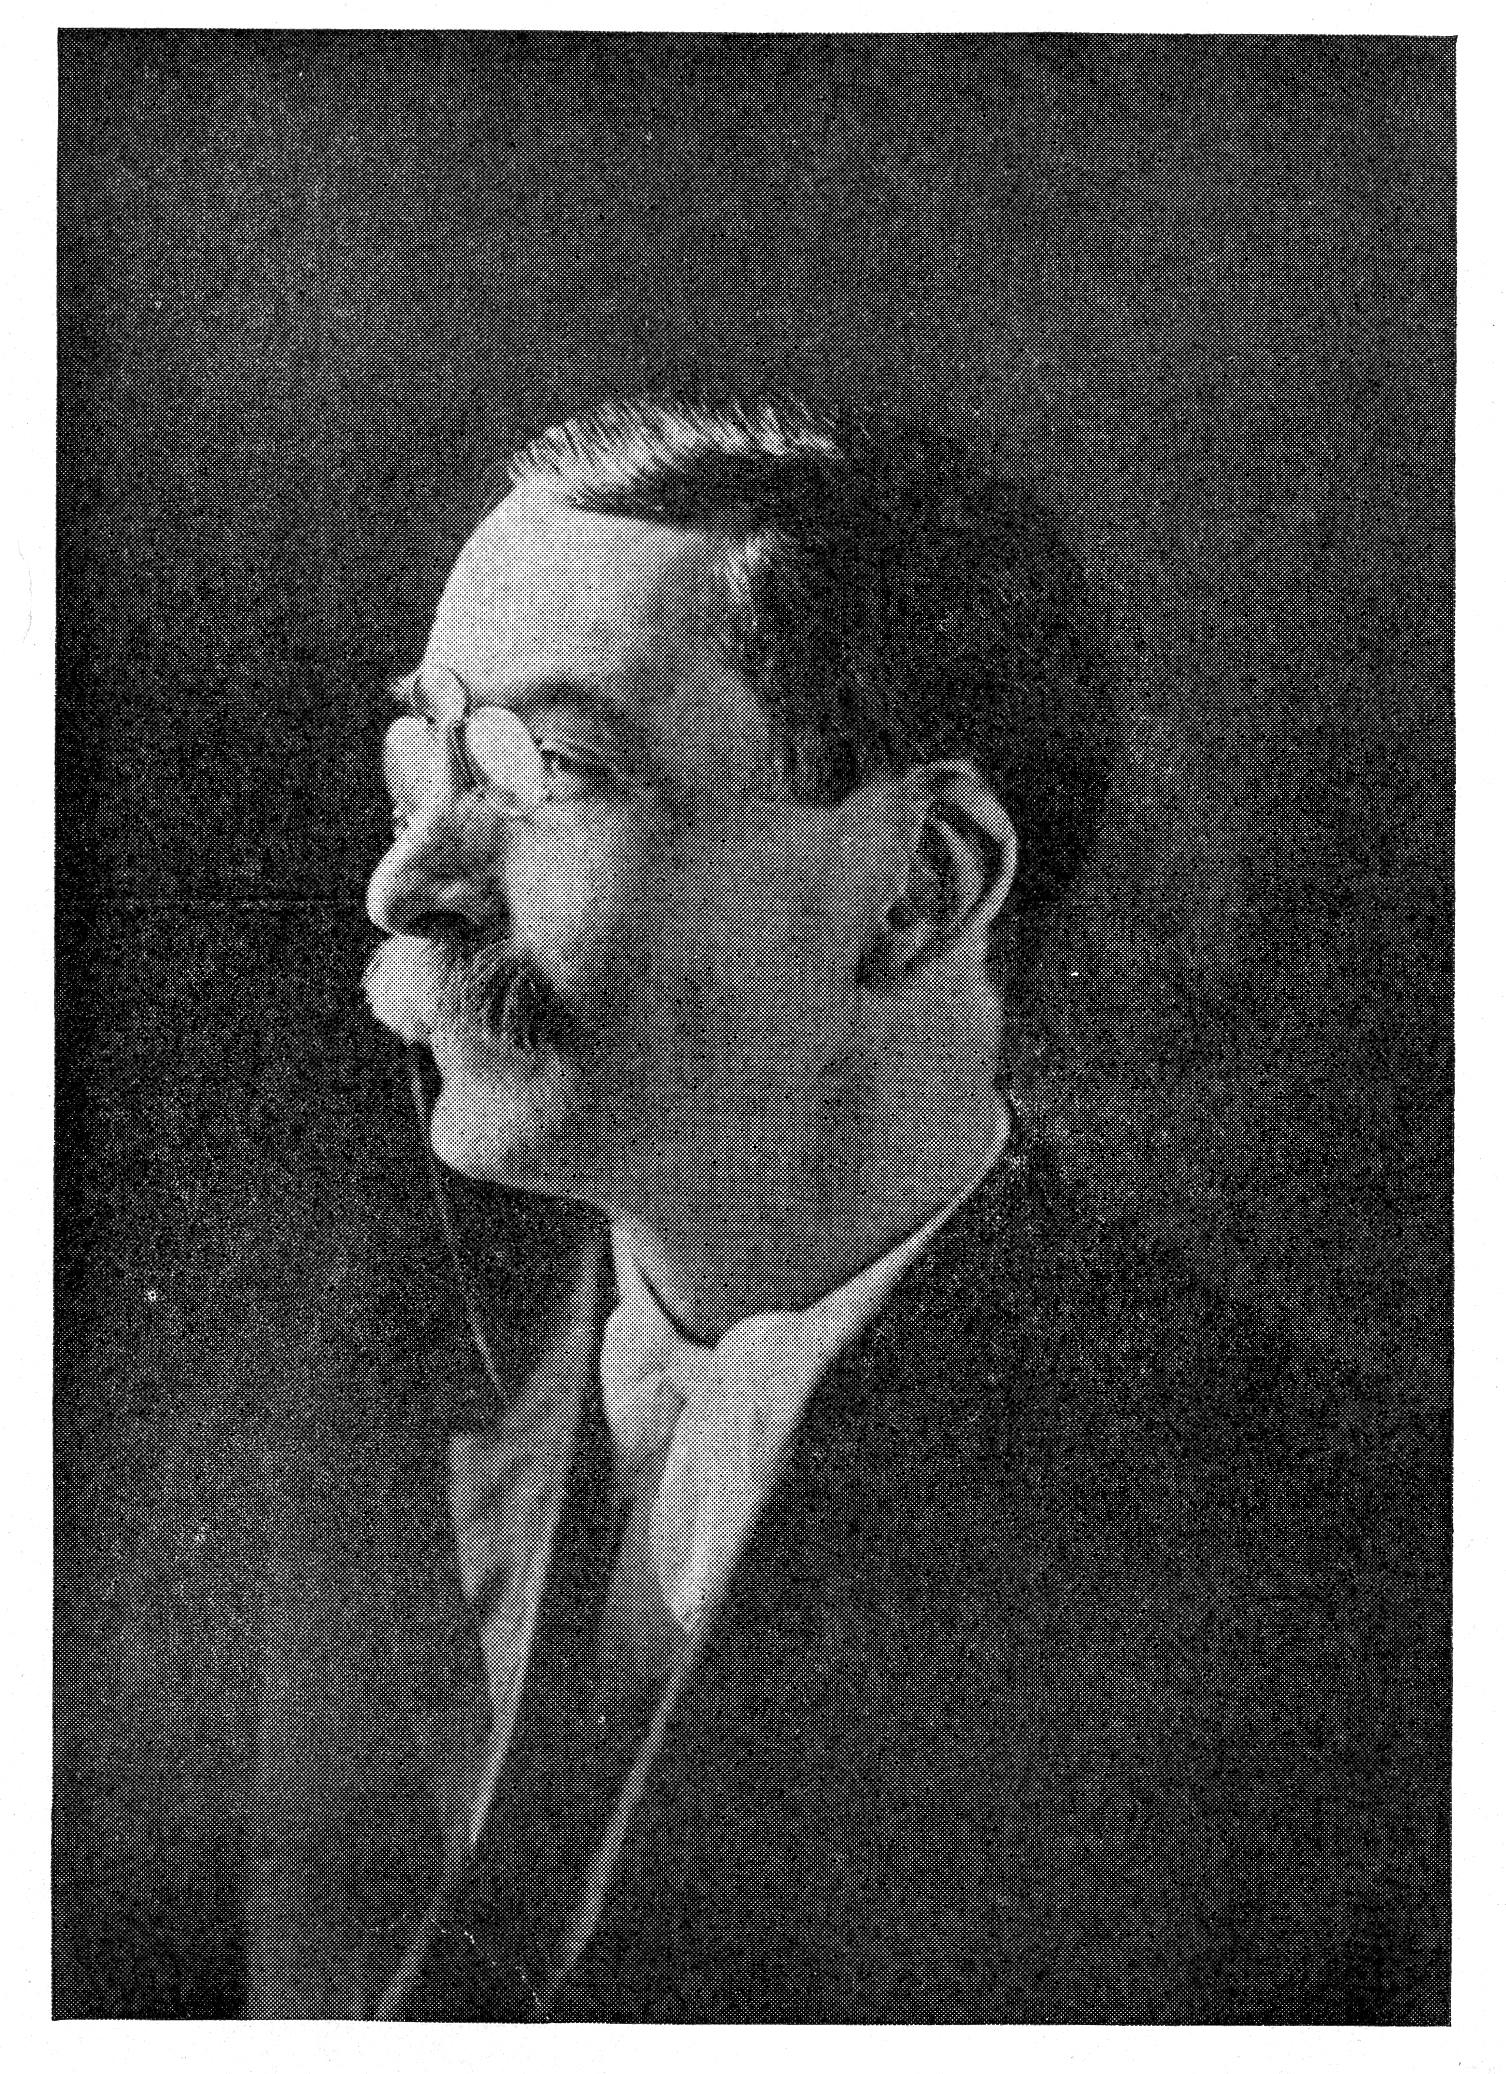 Charles H. Gabriel,  in George C. Stebbins,  Reminiscences and Gospel Hymn Stories  (NY: George H. Doran, 1924).